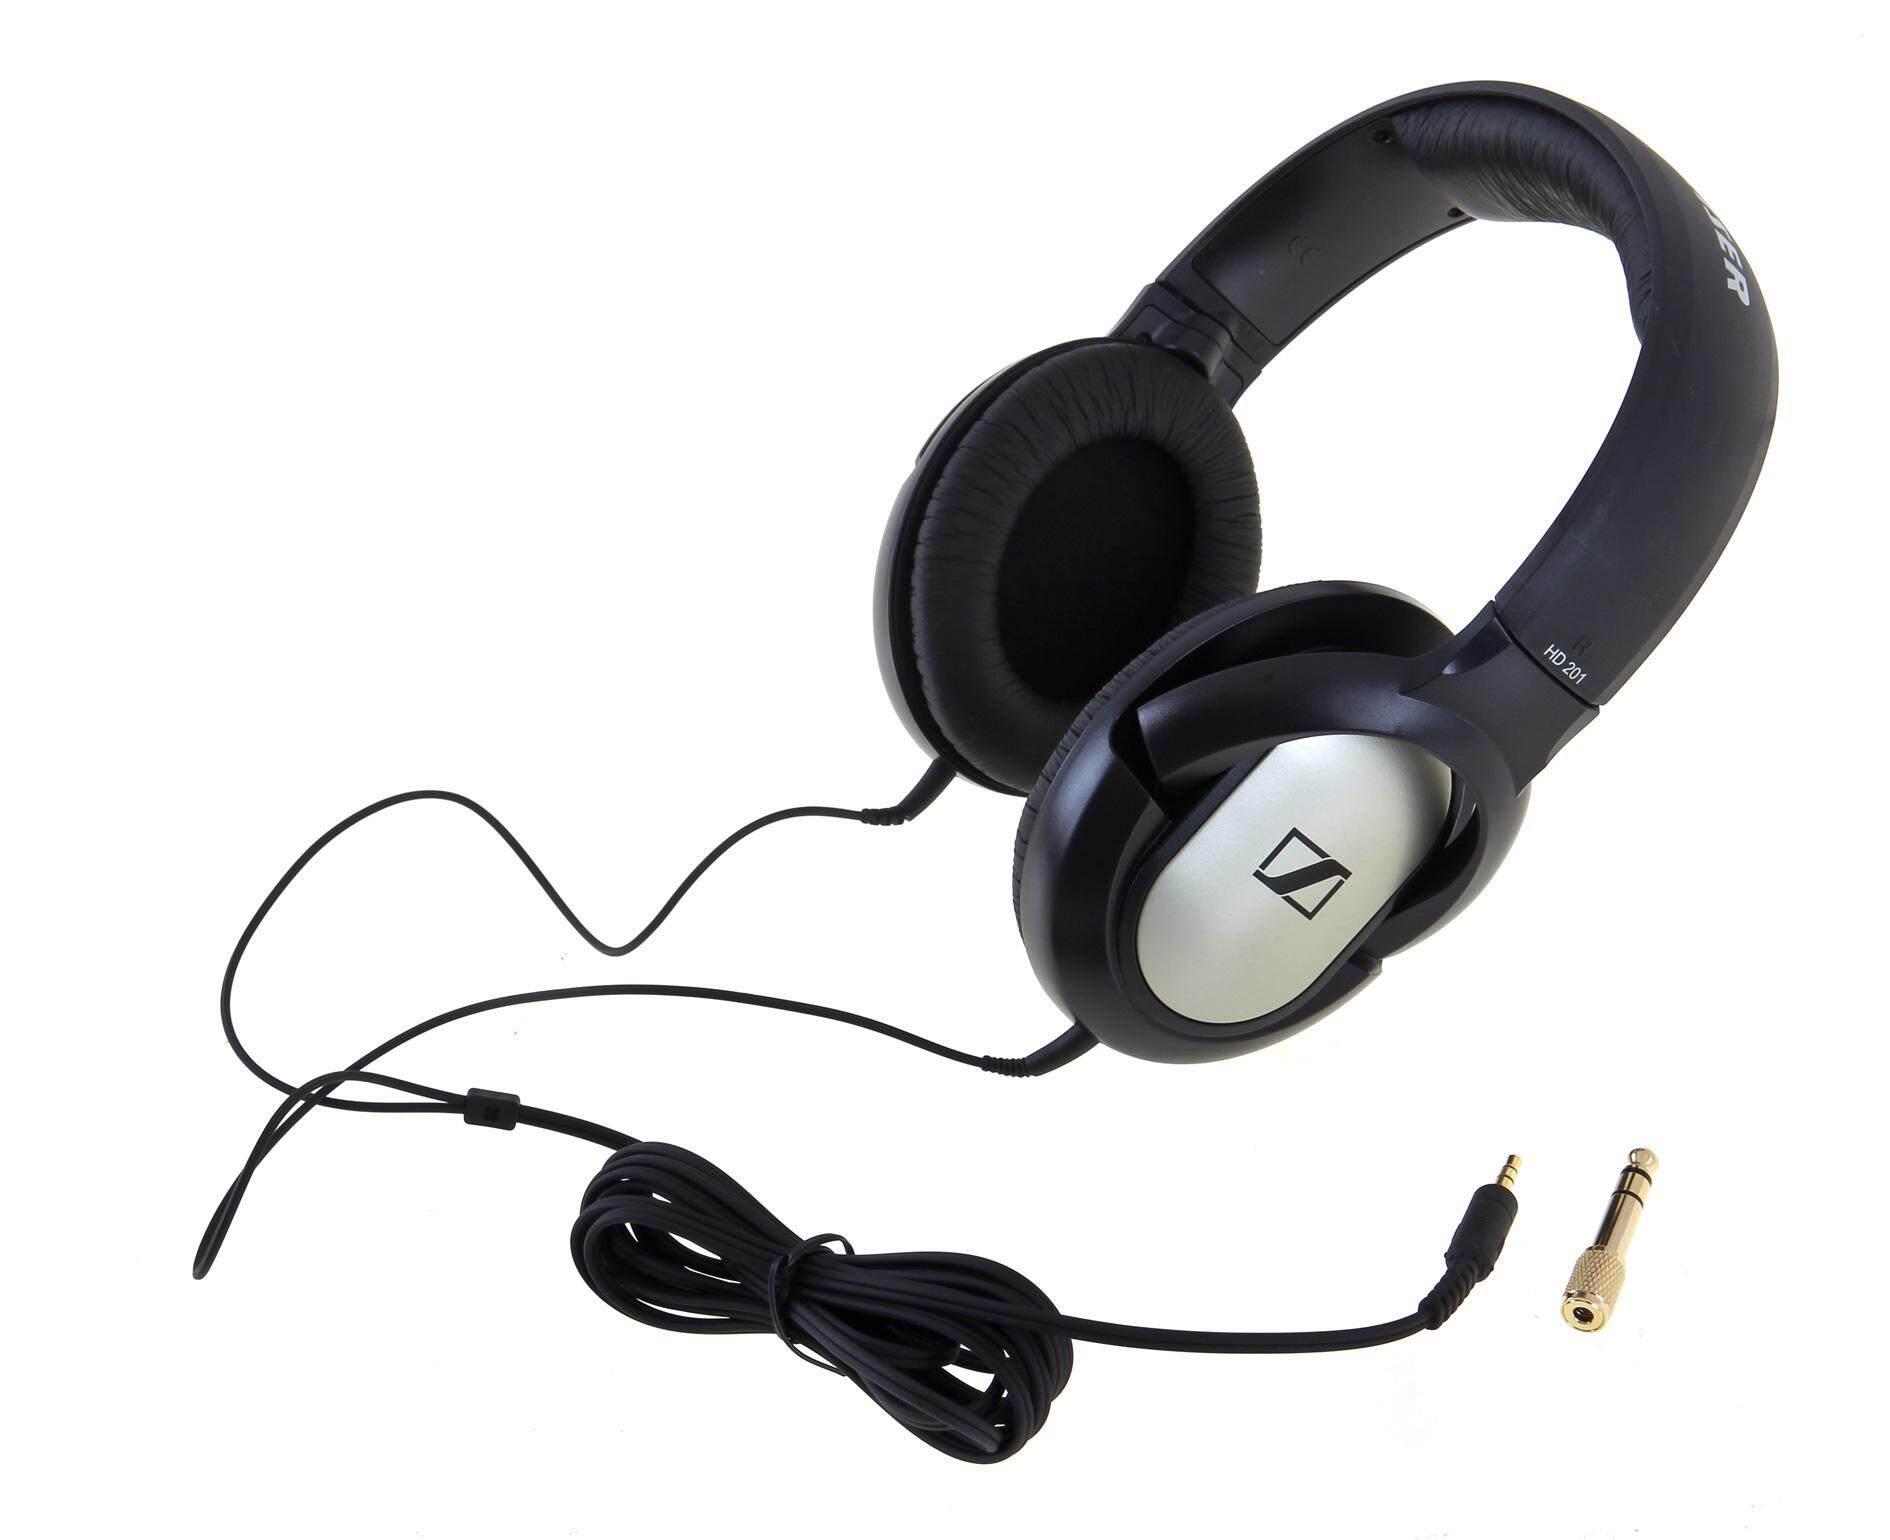 Sennheiser Headphones Headsets Over The Ear Price In Headphone Hd 440 Bt 201